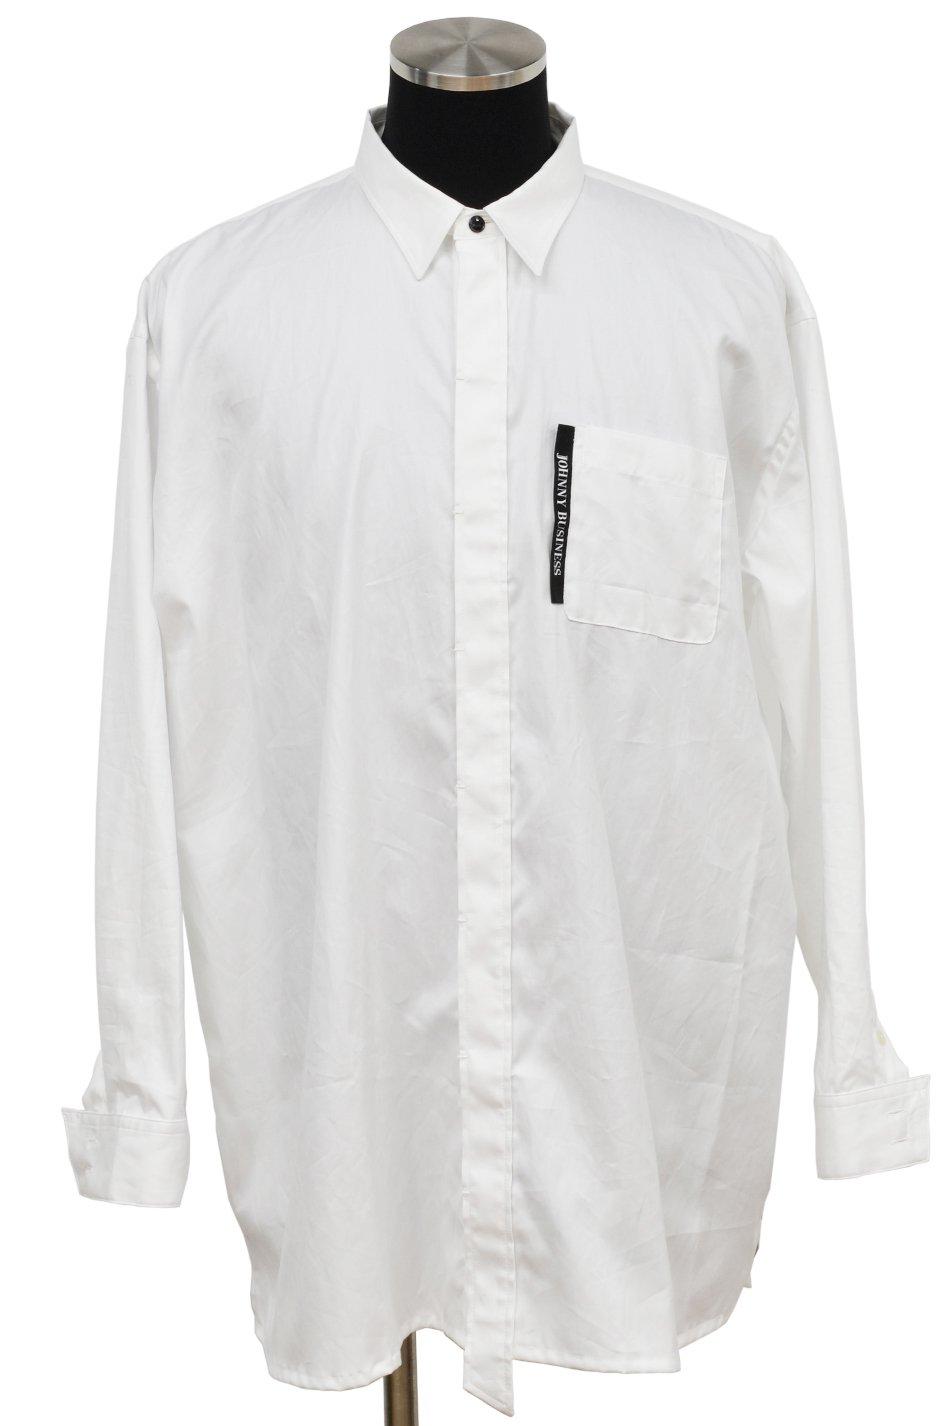 JOHNNY BUSINESS(ジョニービジネス )Plane Shirt / White